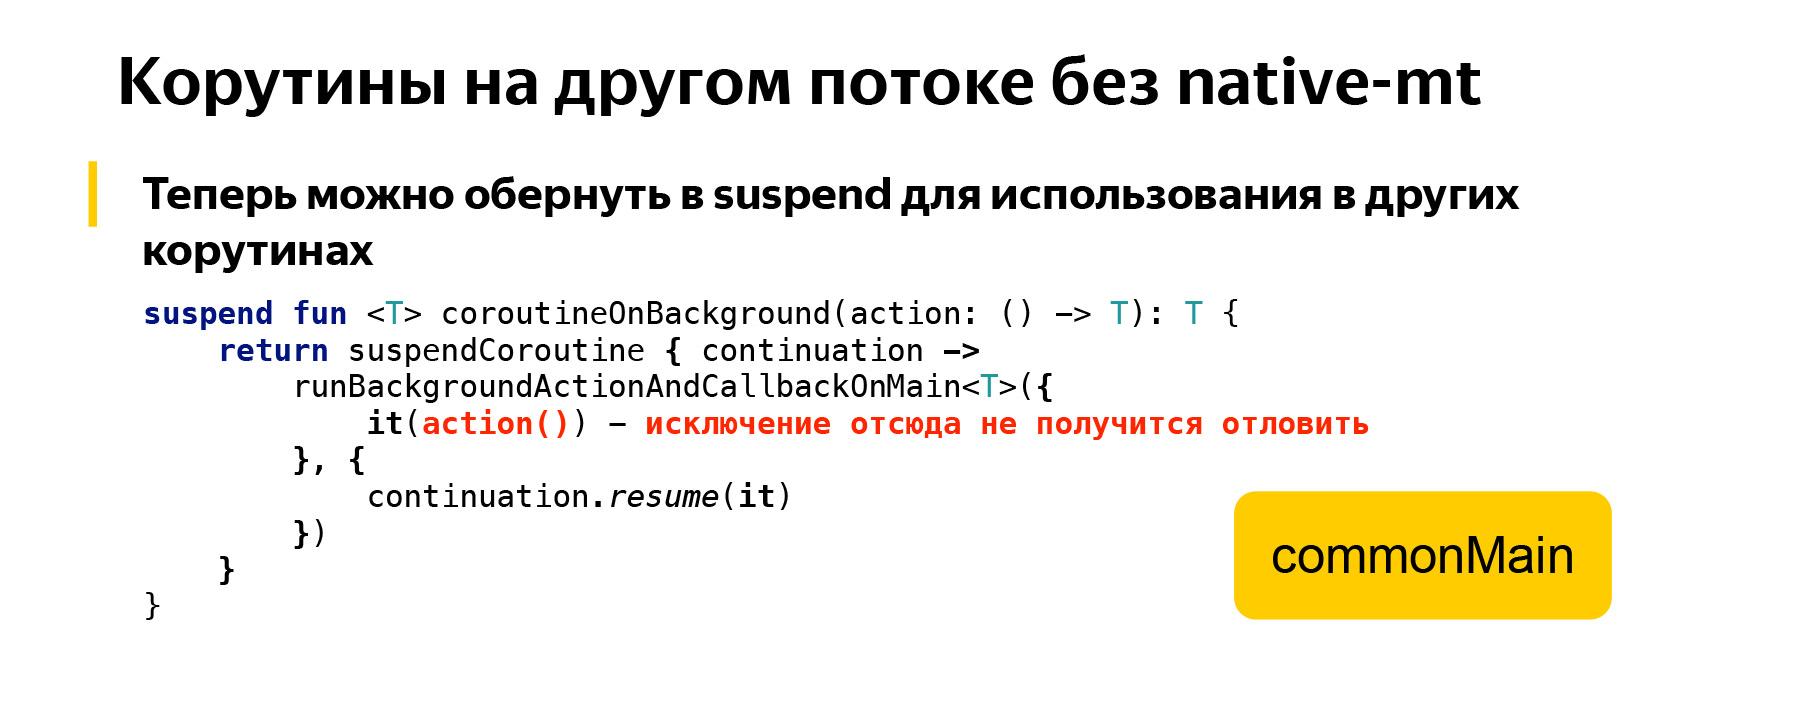 ijuhh_4spibviyx3qub_u21st0u.jpeg